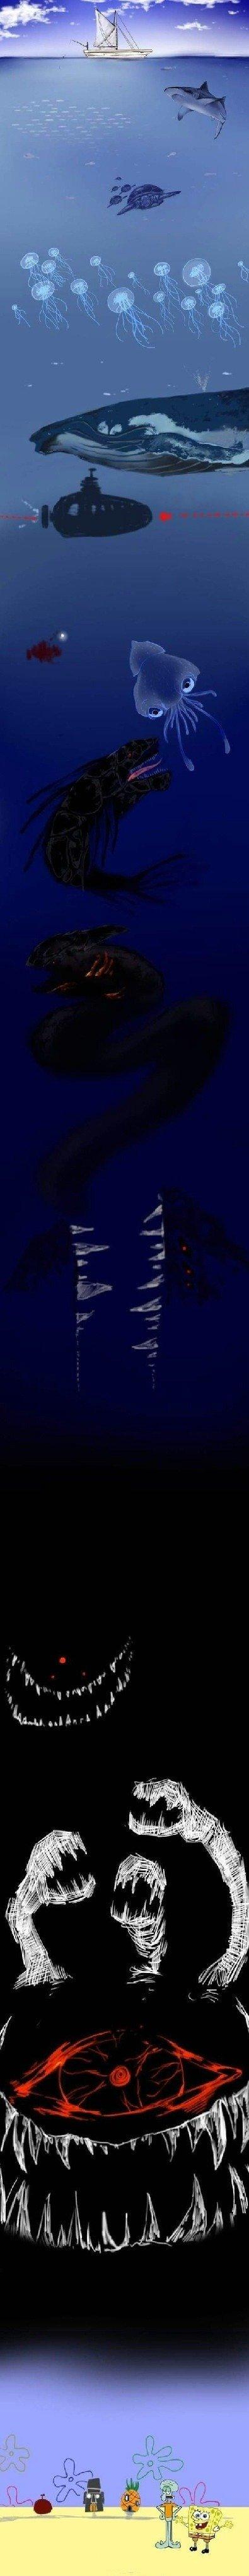 Scary Sea Monsters. . Iir- Scary Sea Monsters Iir-